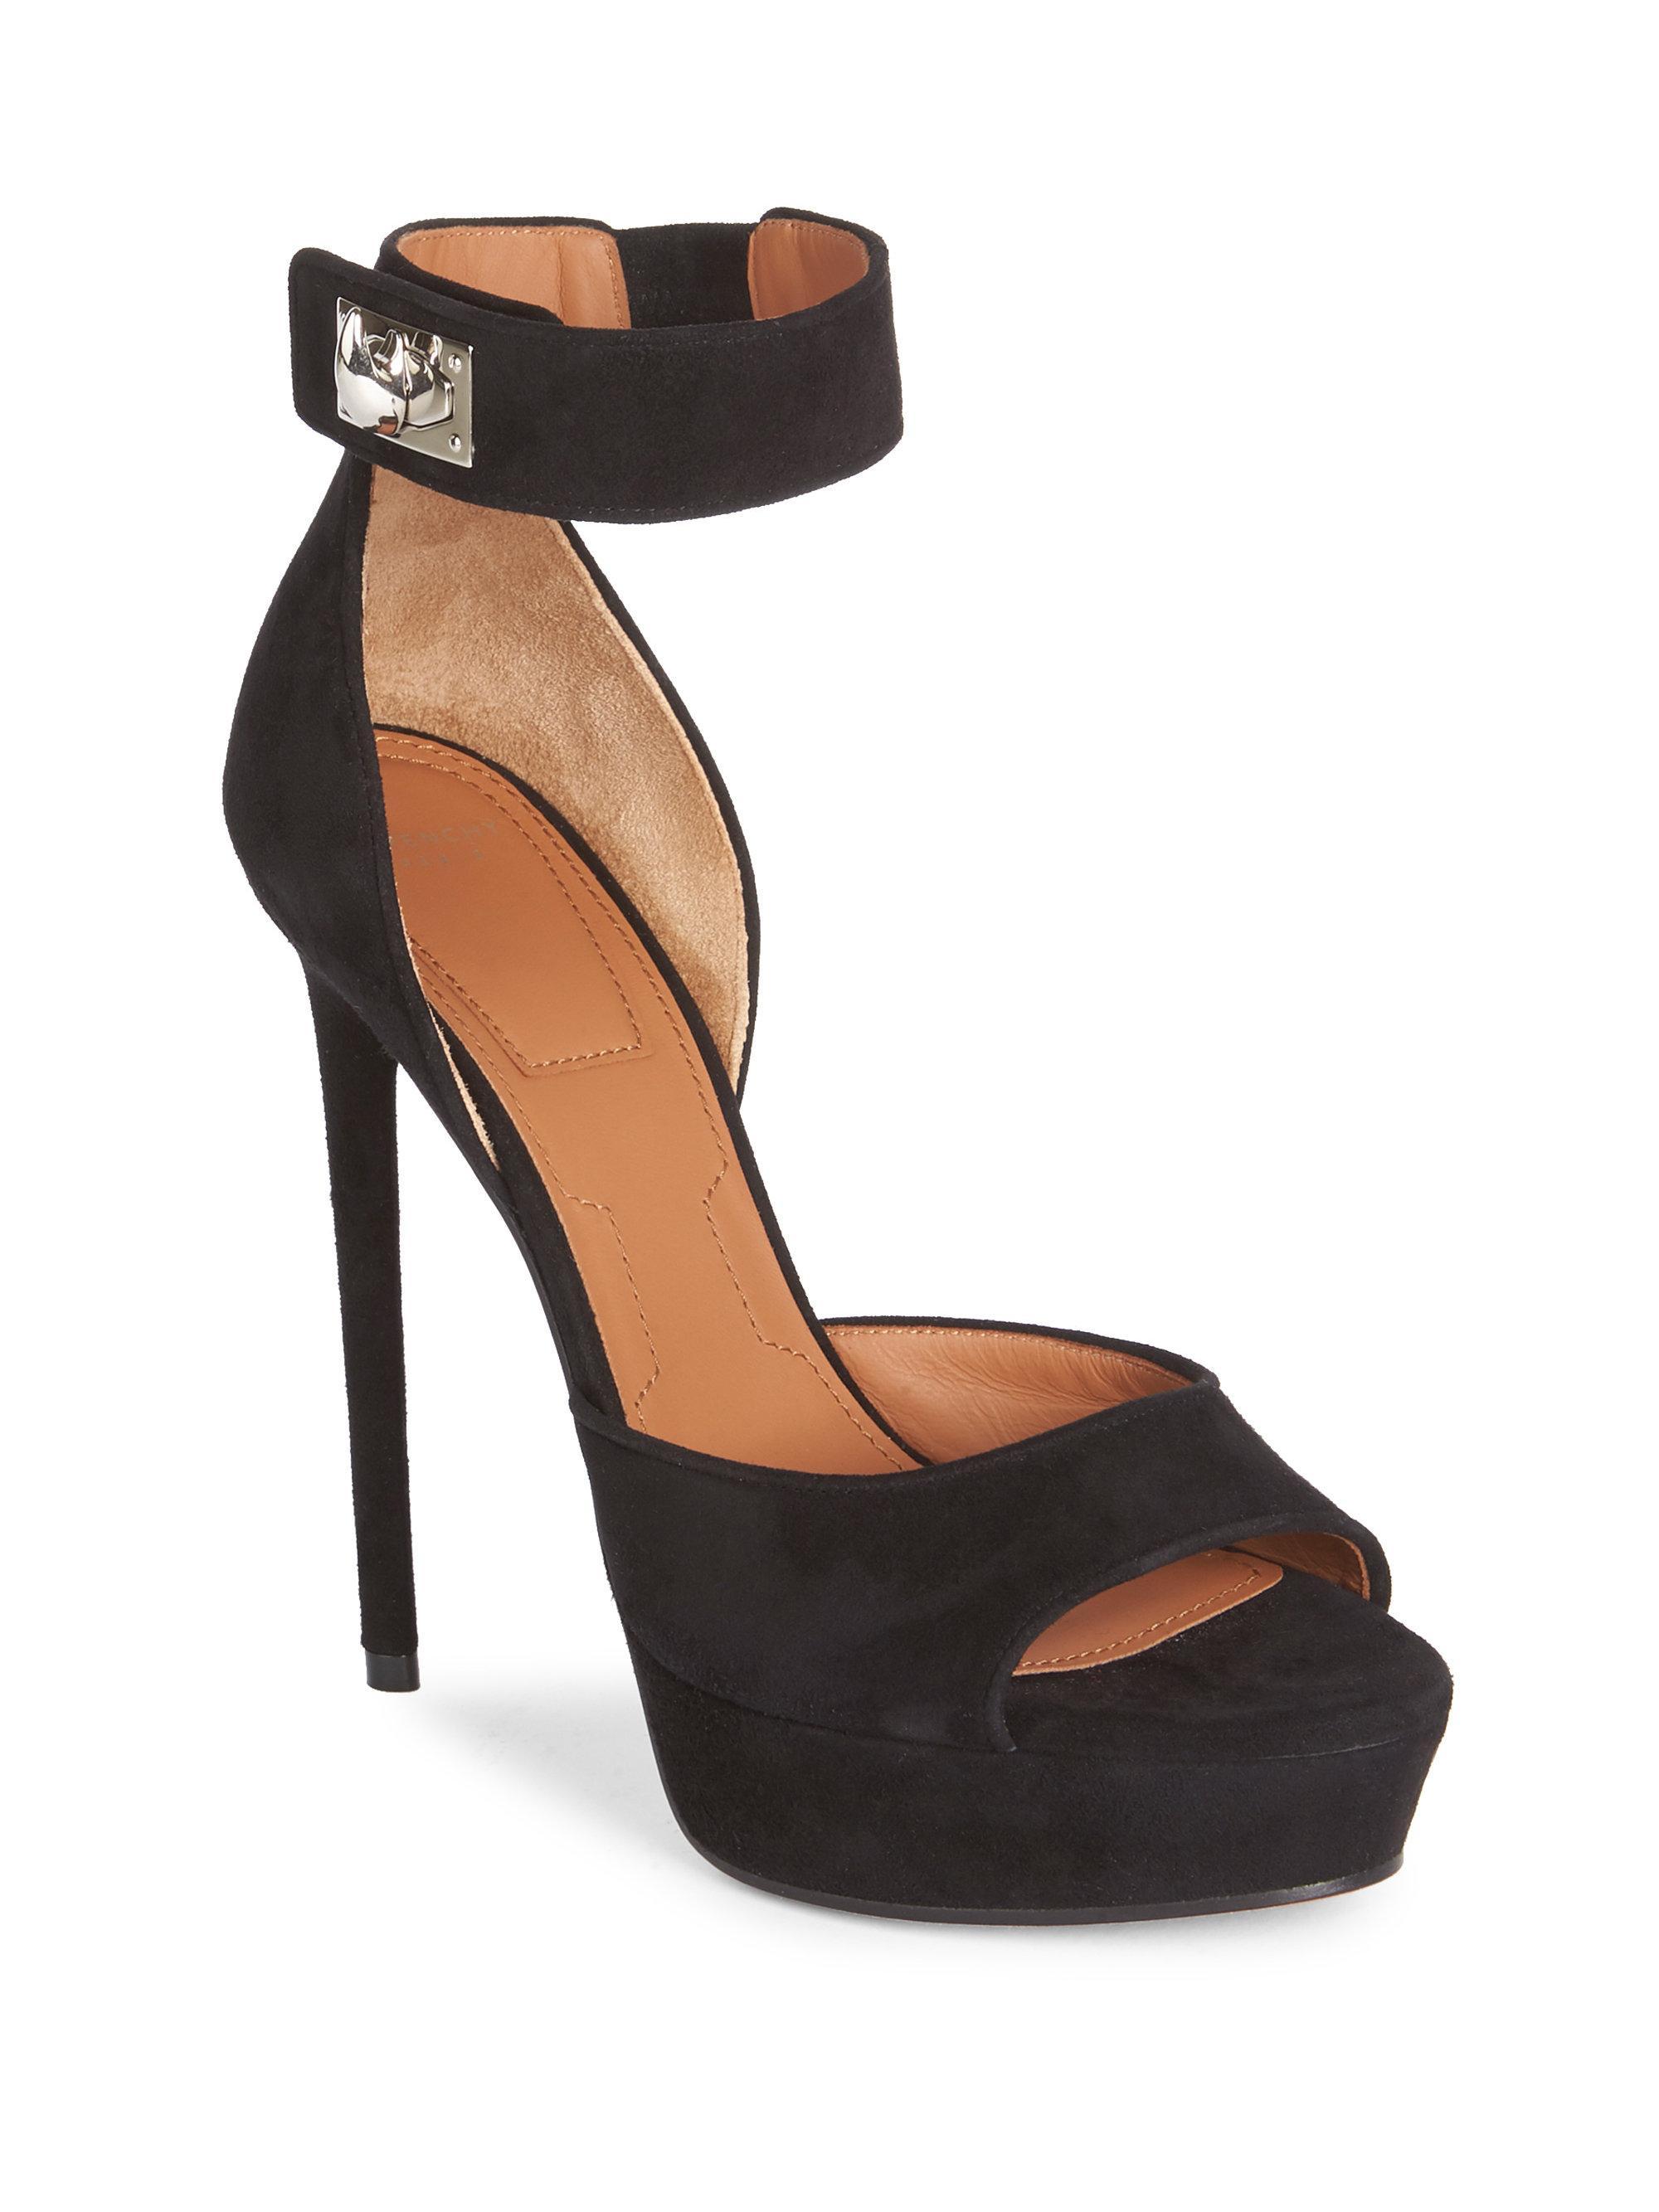 e91fffc5f62 Lyst - Givenchy Suede Shark-lock Platform Sandals in Black